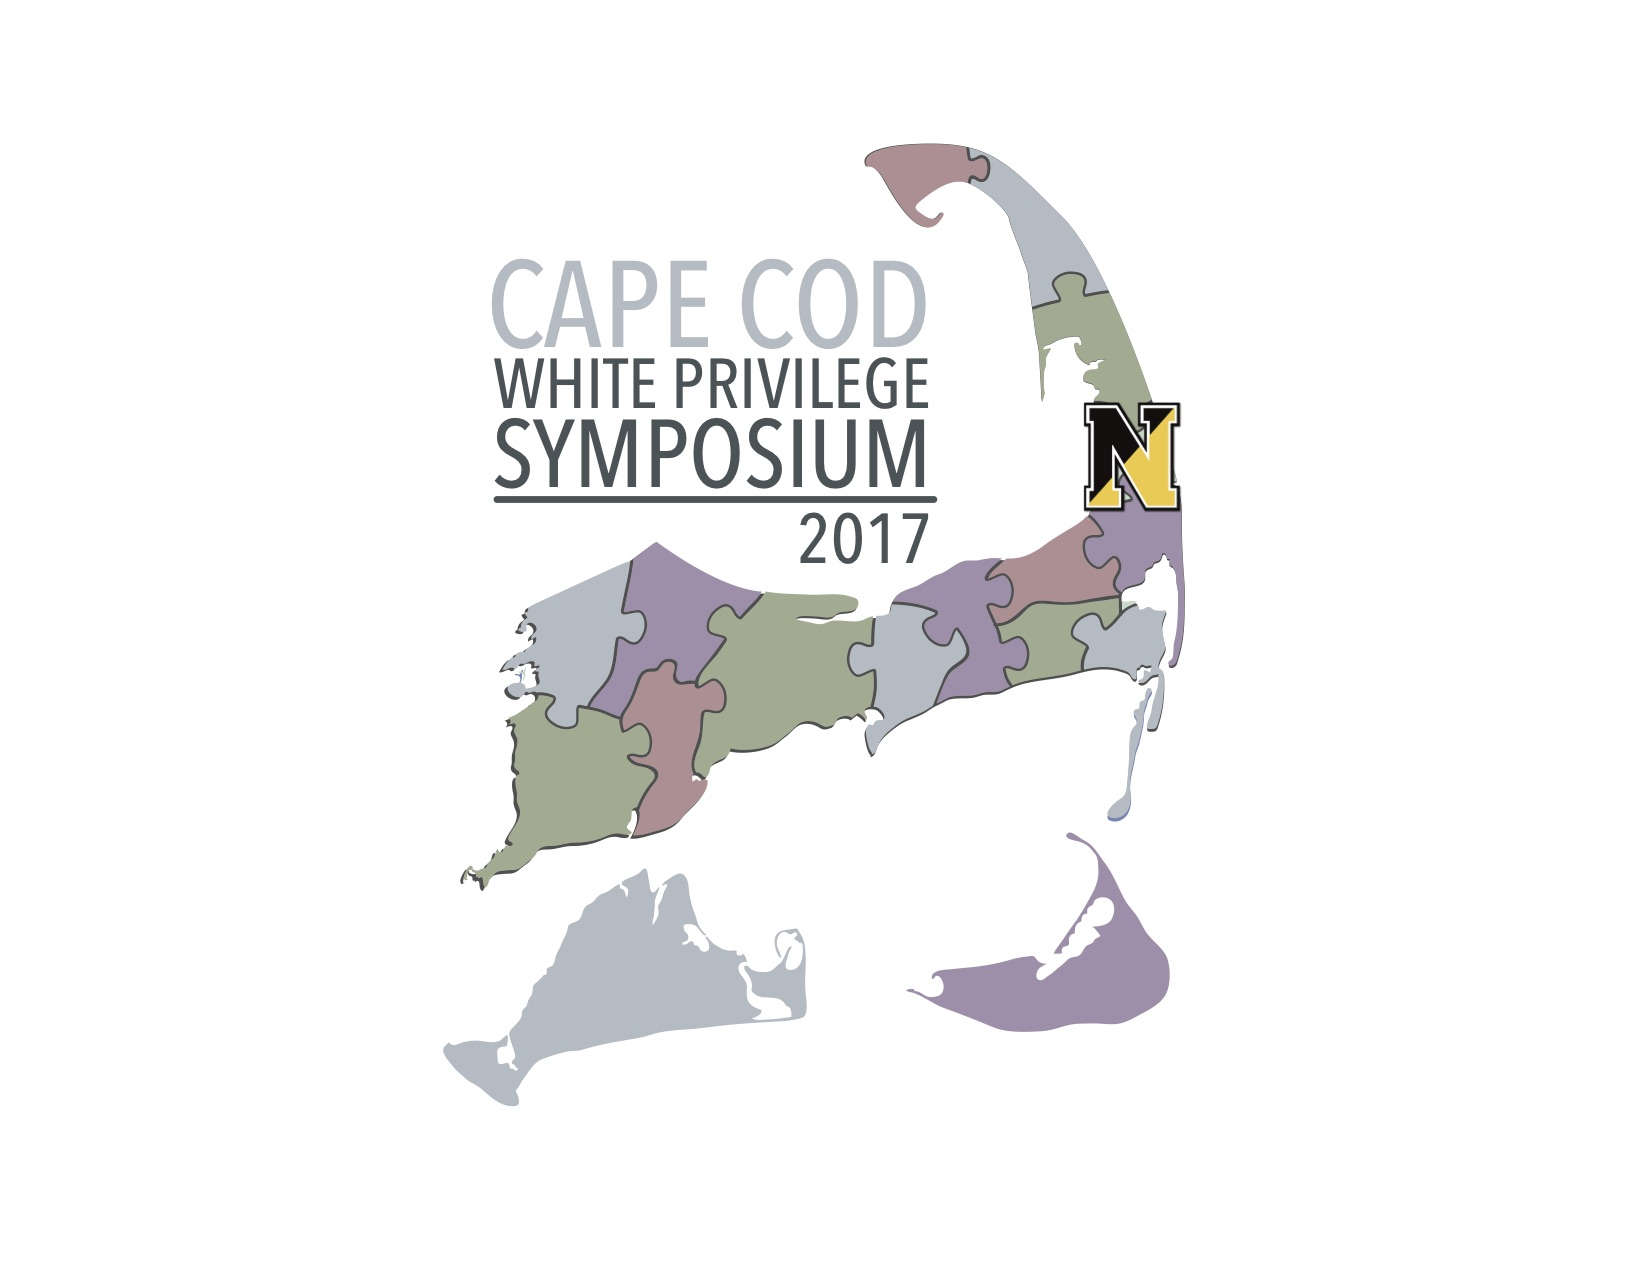 SEED Founder Peggy McIntosh to Speak at White Privilege Symposium Cape Cod